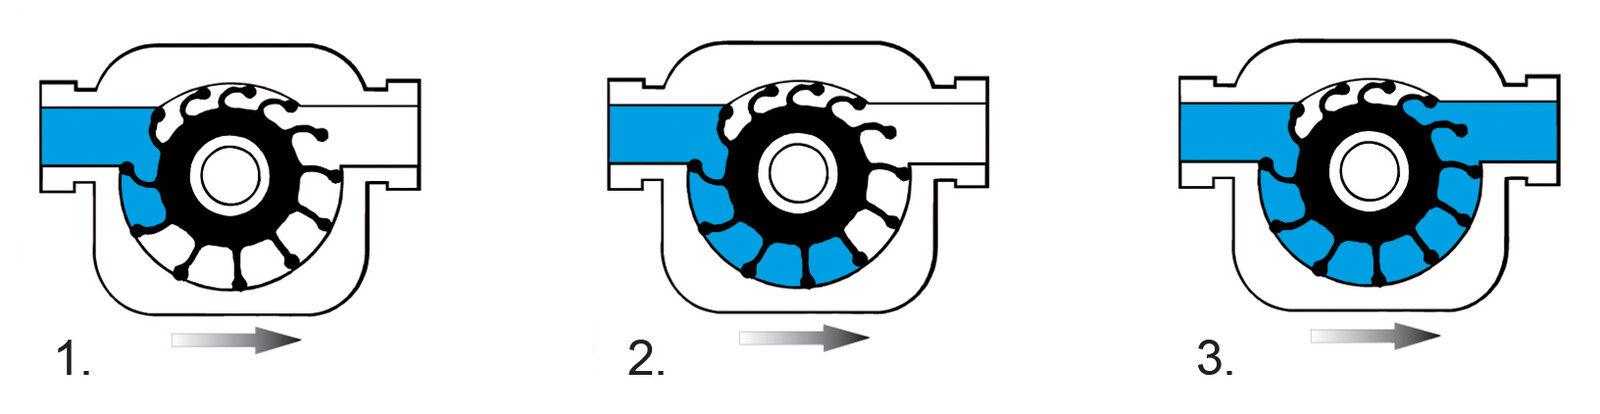 EPDM impeller para ma bomba a, 30 litros, sustitución, impeller impellerpumpe